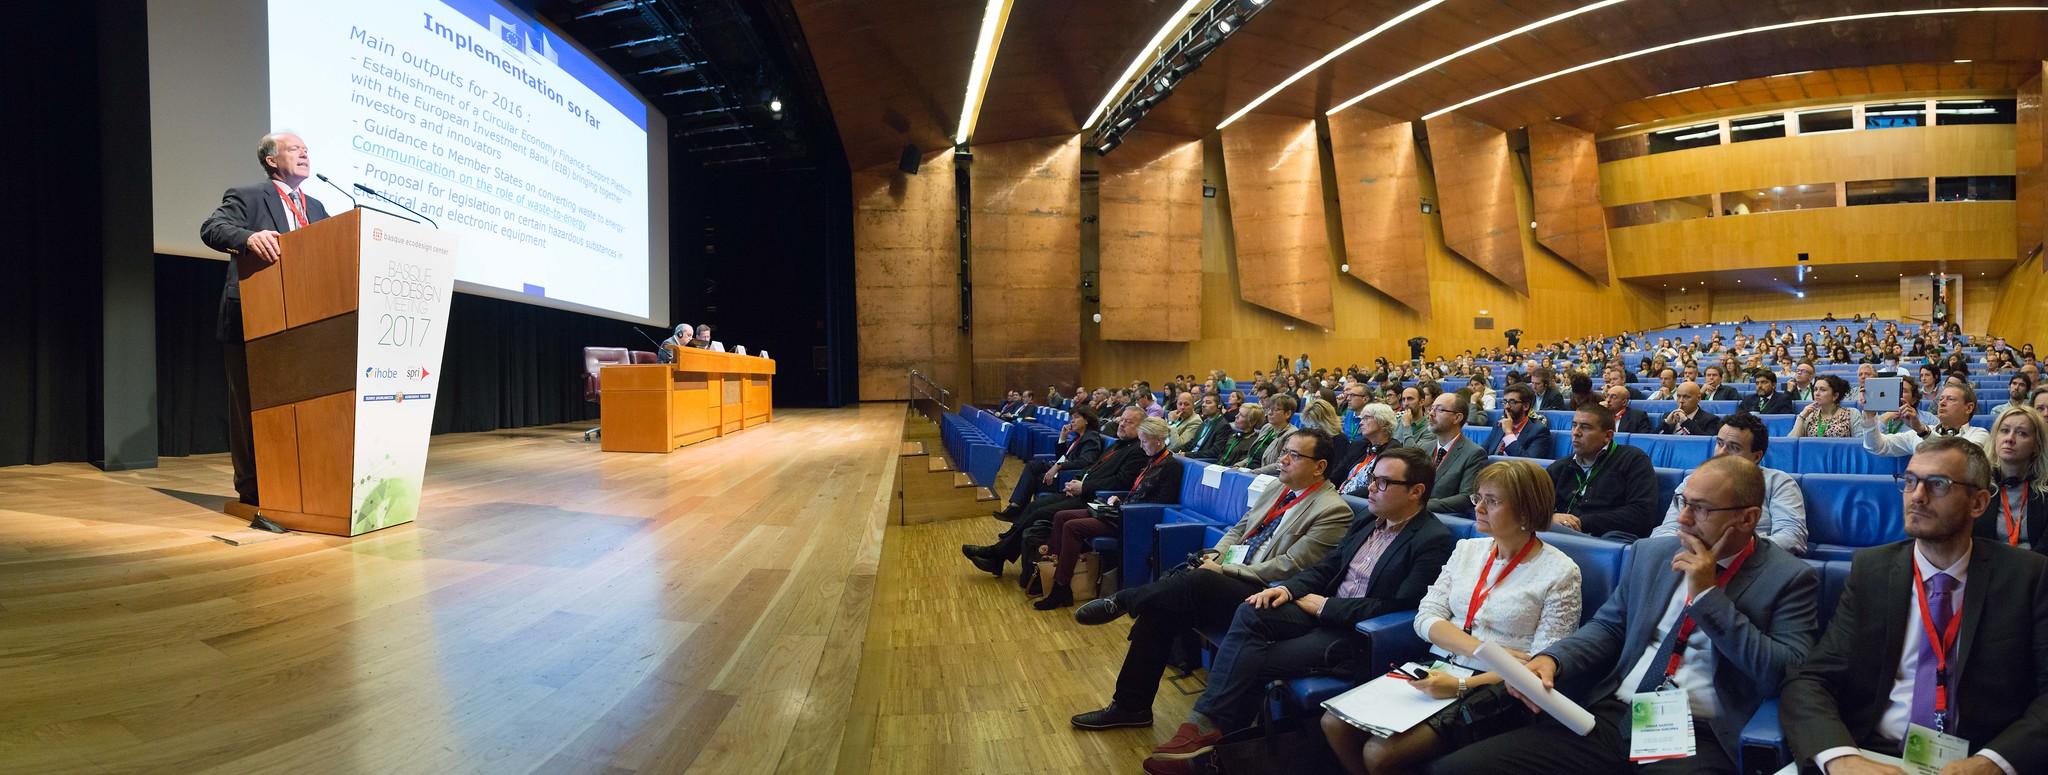 Basque Ecodesign Meeting 2017